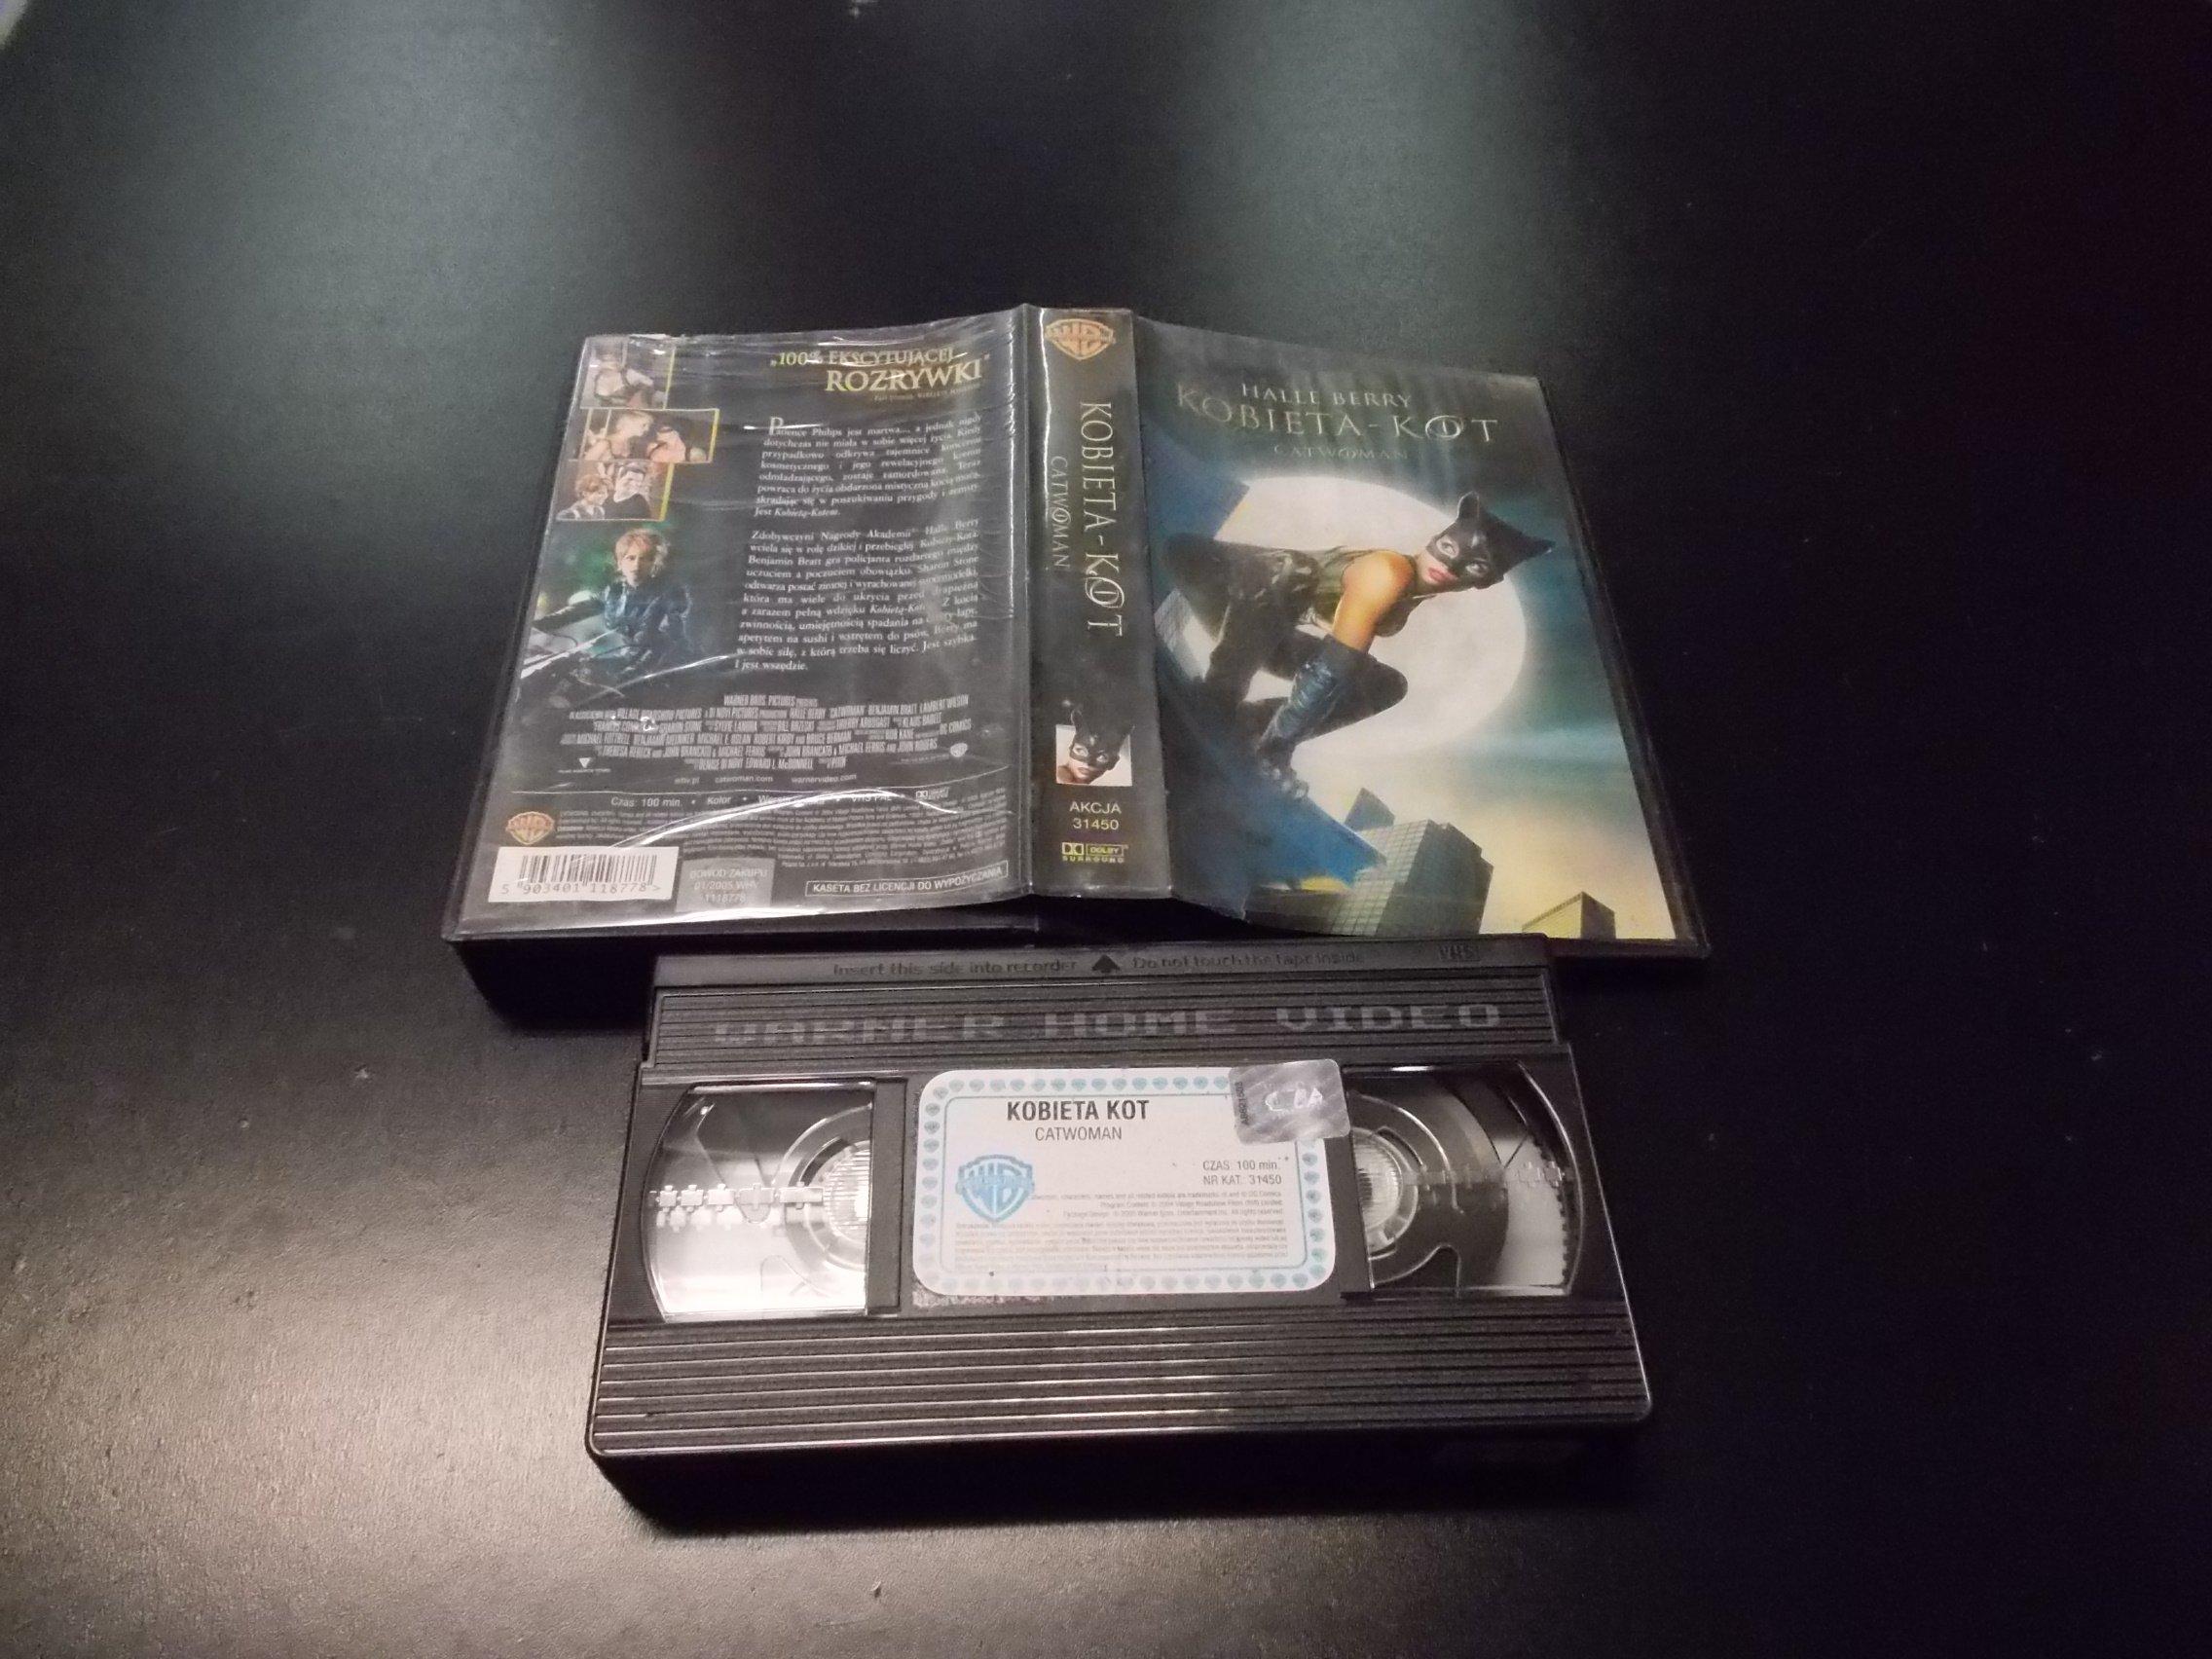 KOBIETA KOT -  kaseta VHS - 1149 Opole - AlleOpole.pl